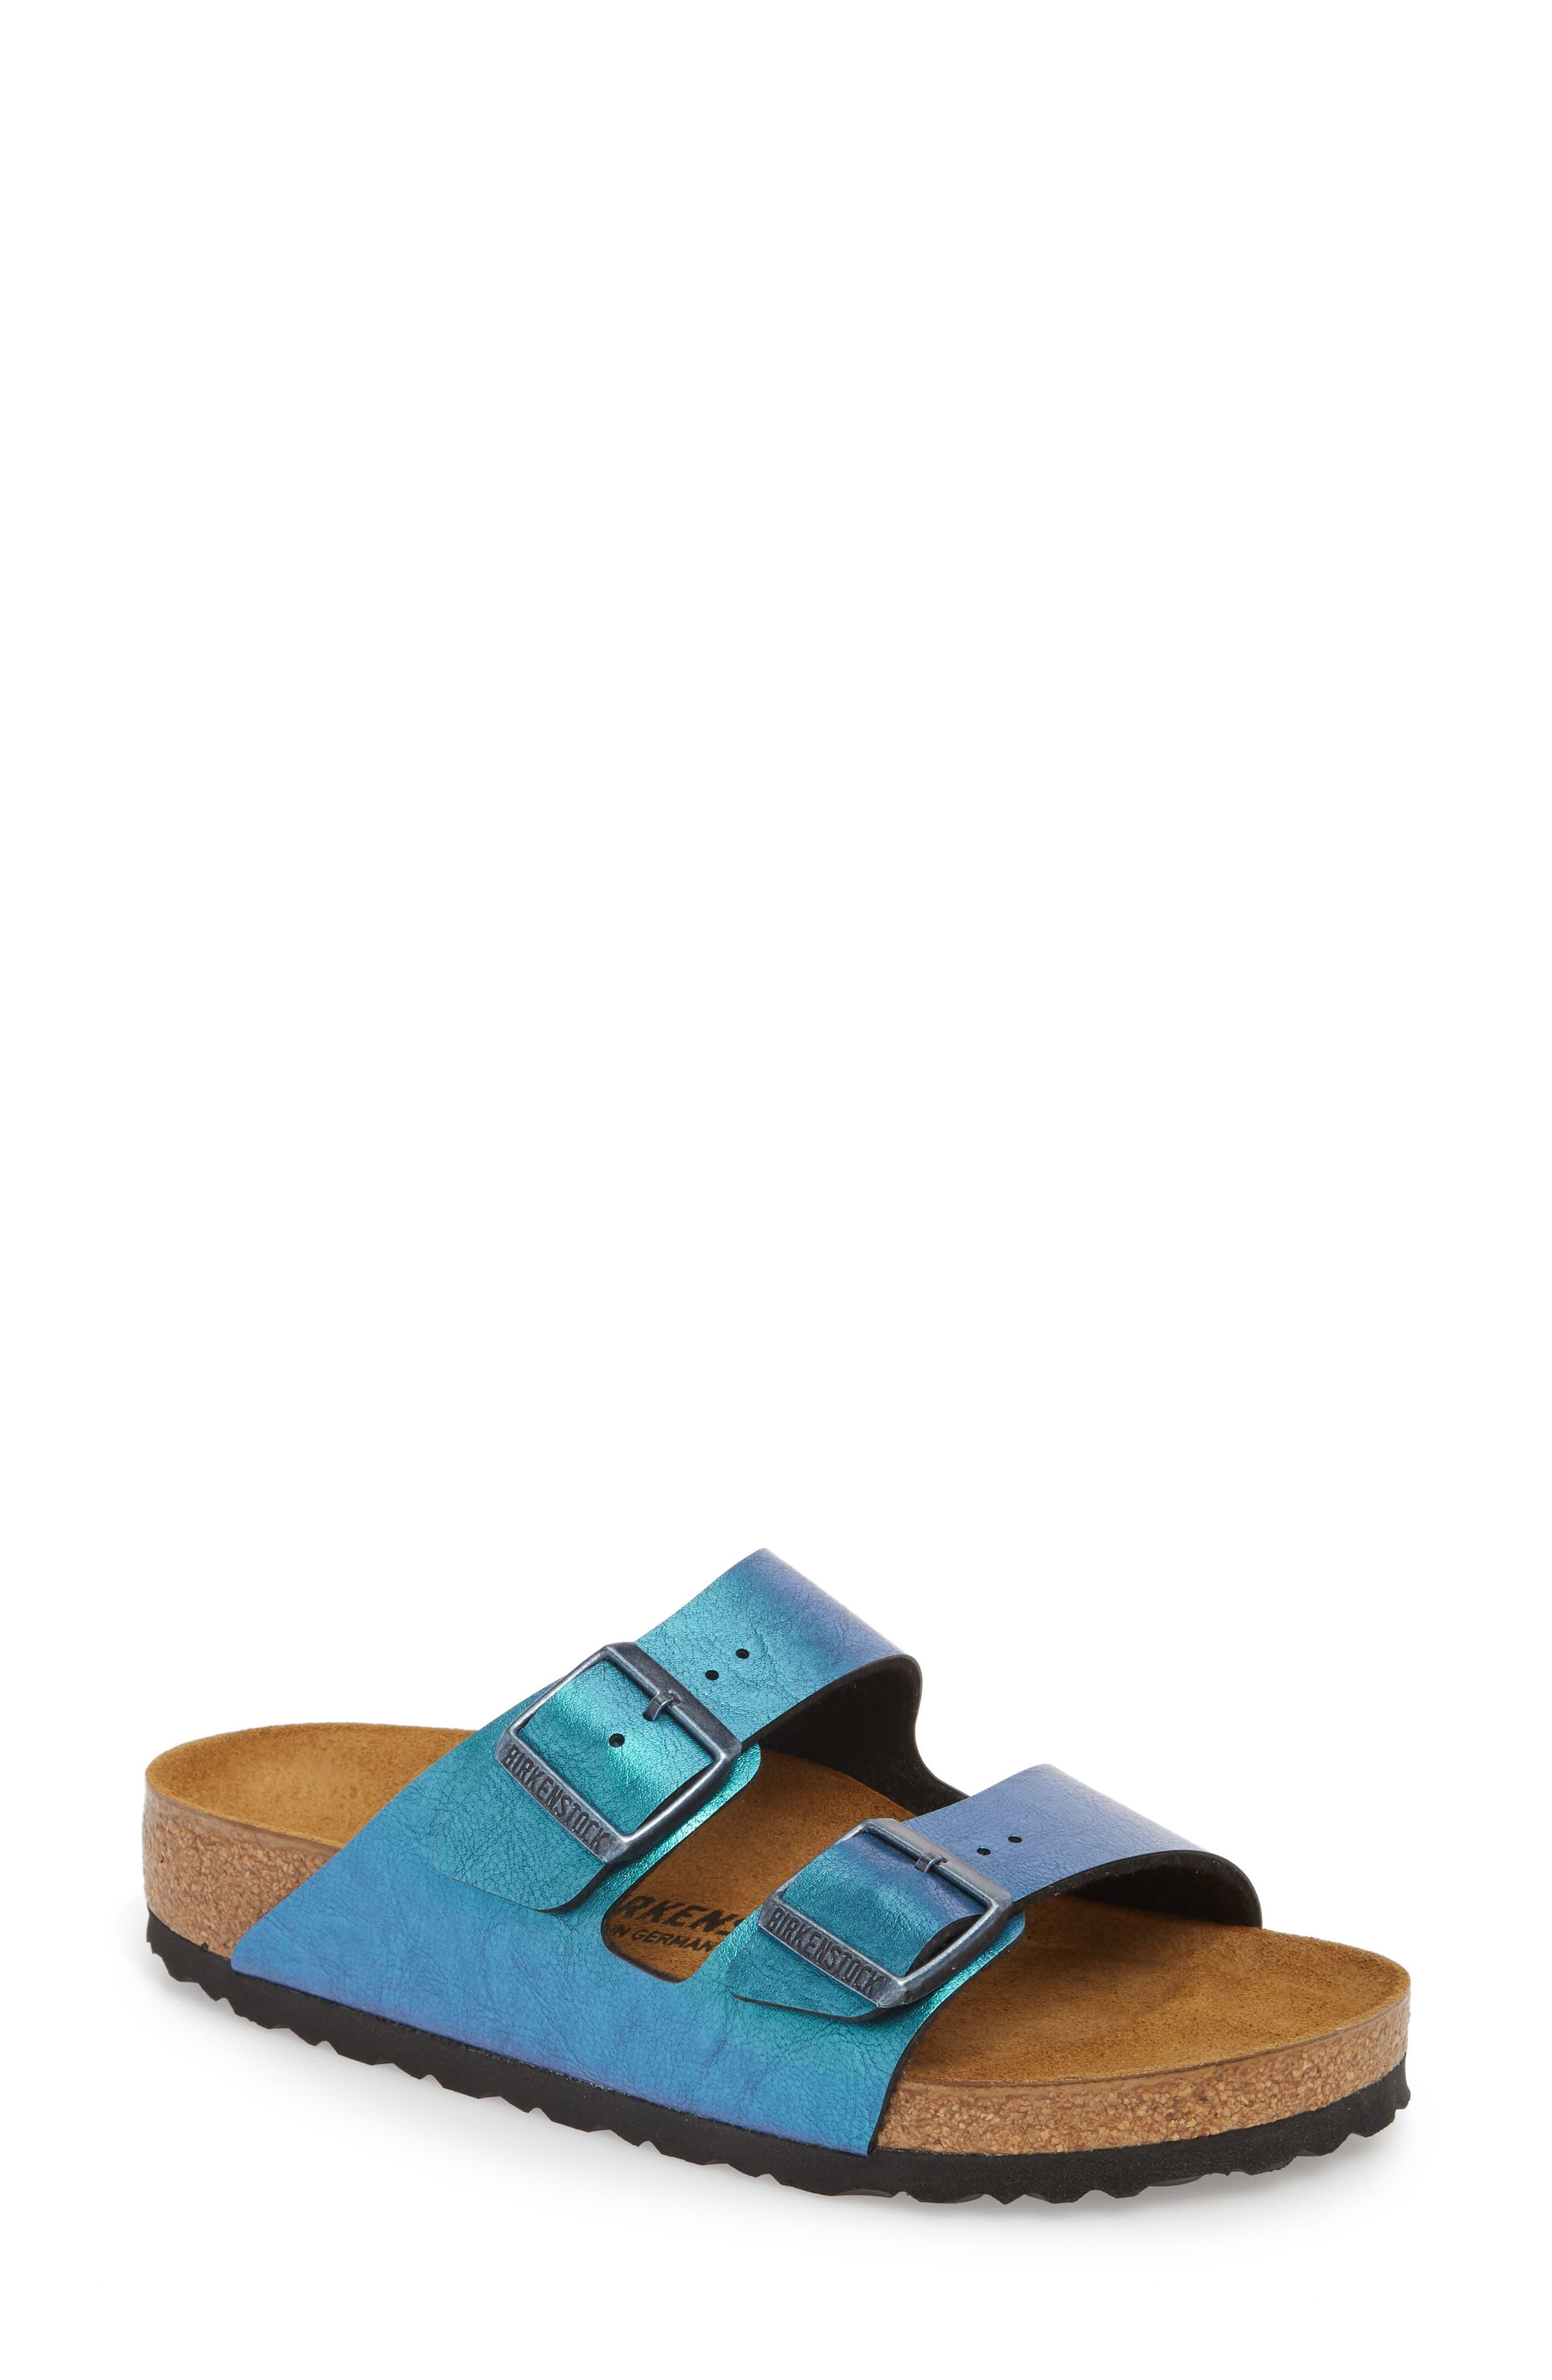 Arizona Graceful Birko-Flor<sup>™</sup> Sandal,                         Main,                         color, Blue